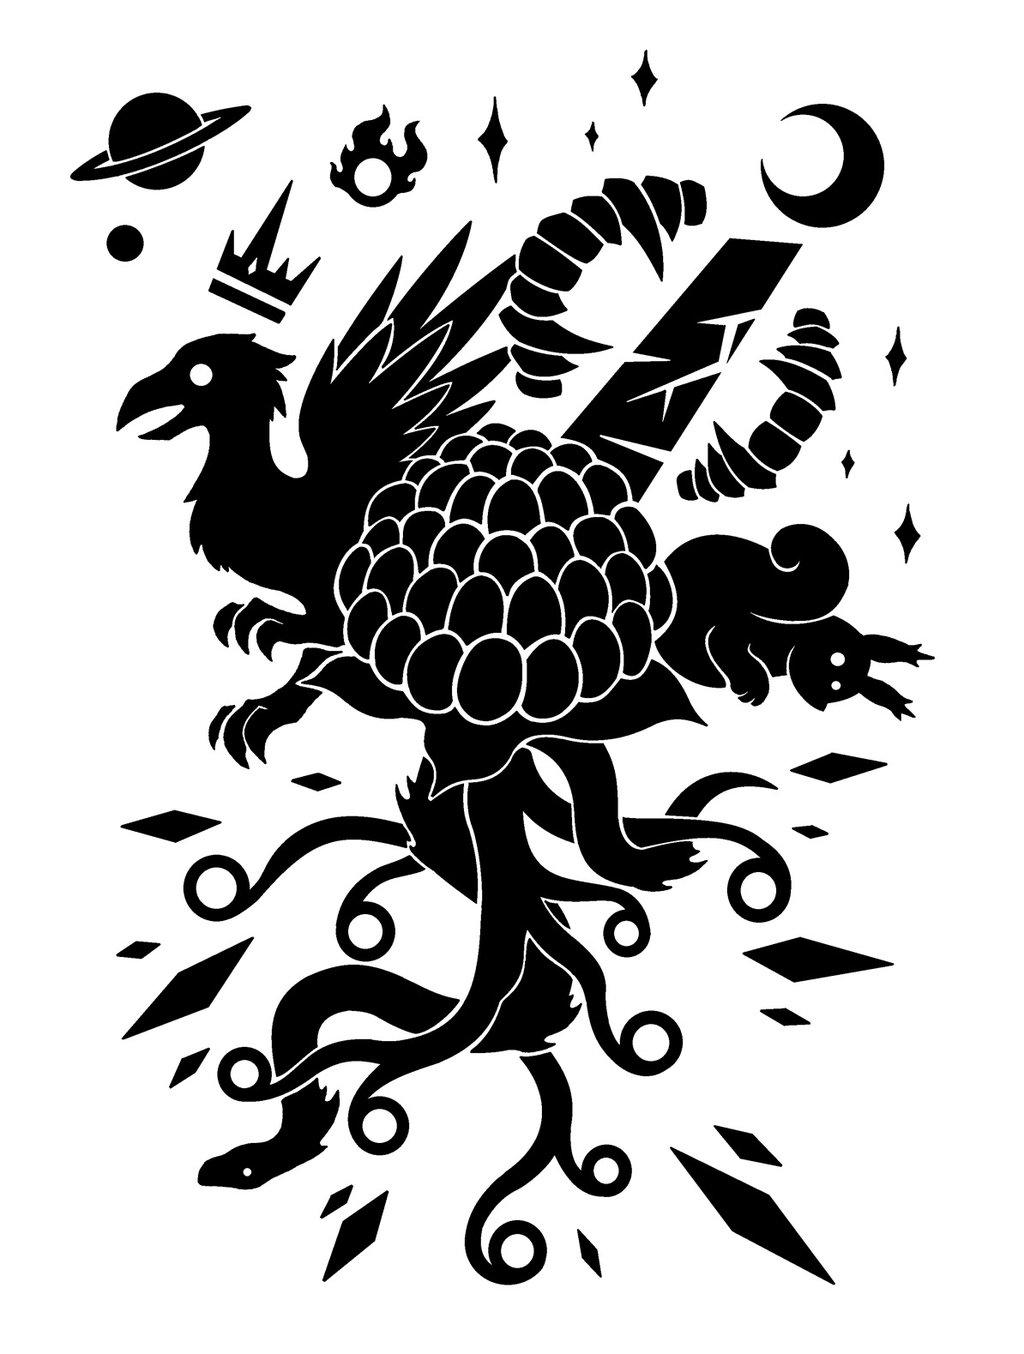 black black and white leaf pattern silhouette tree design bird